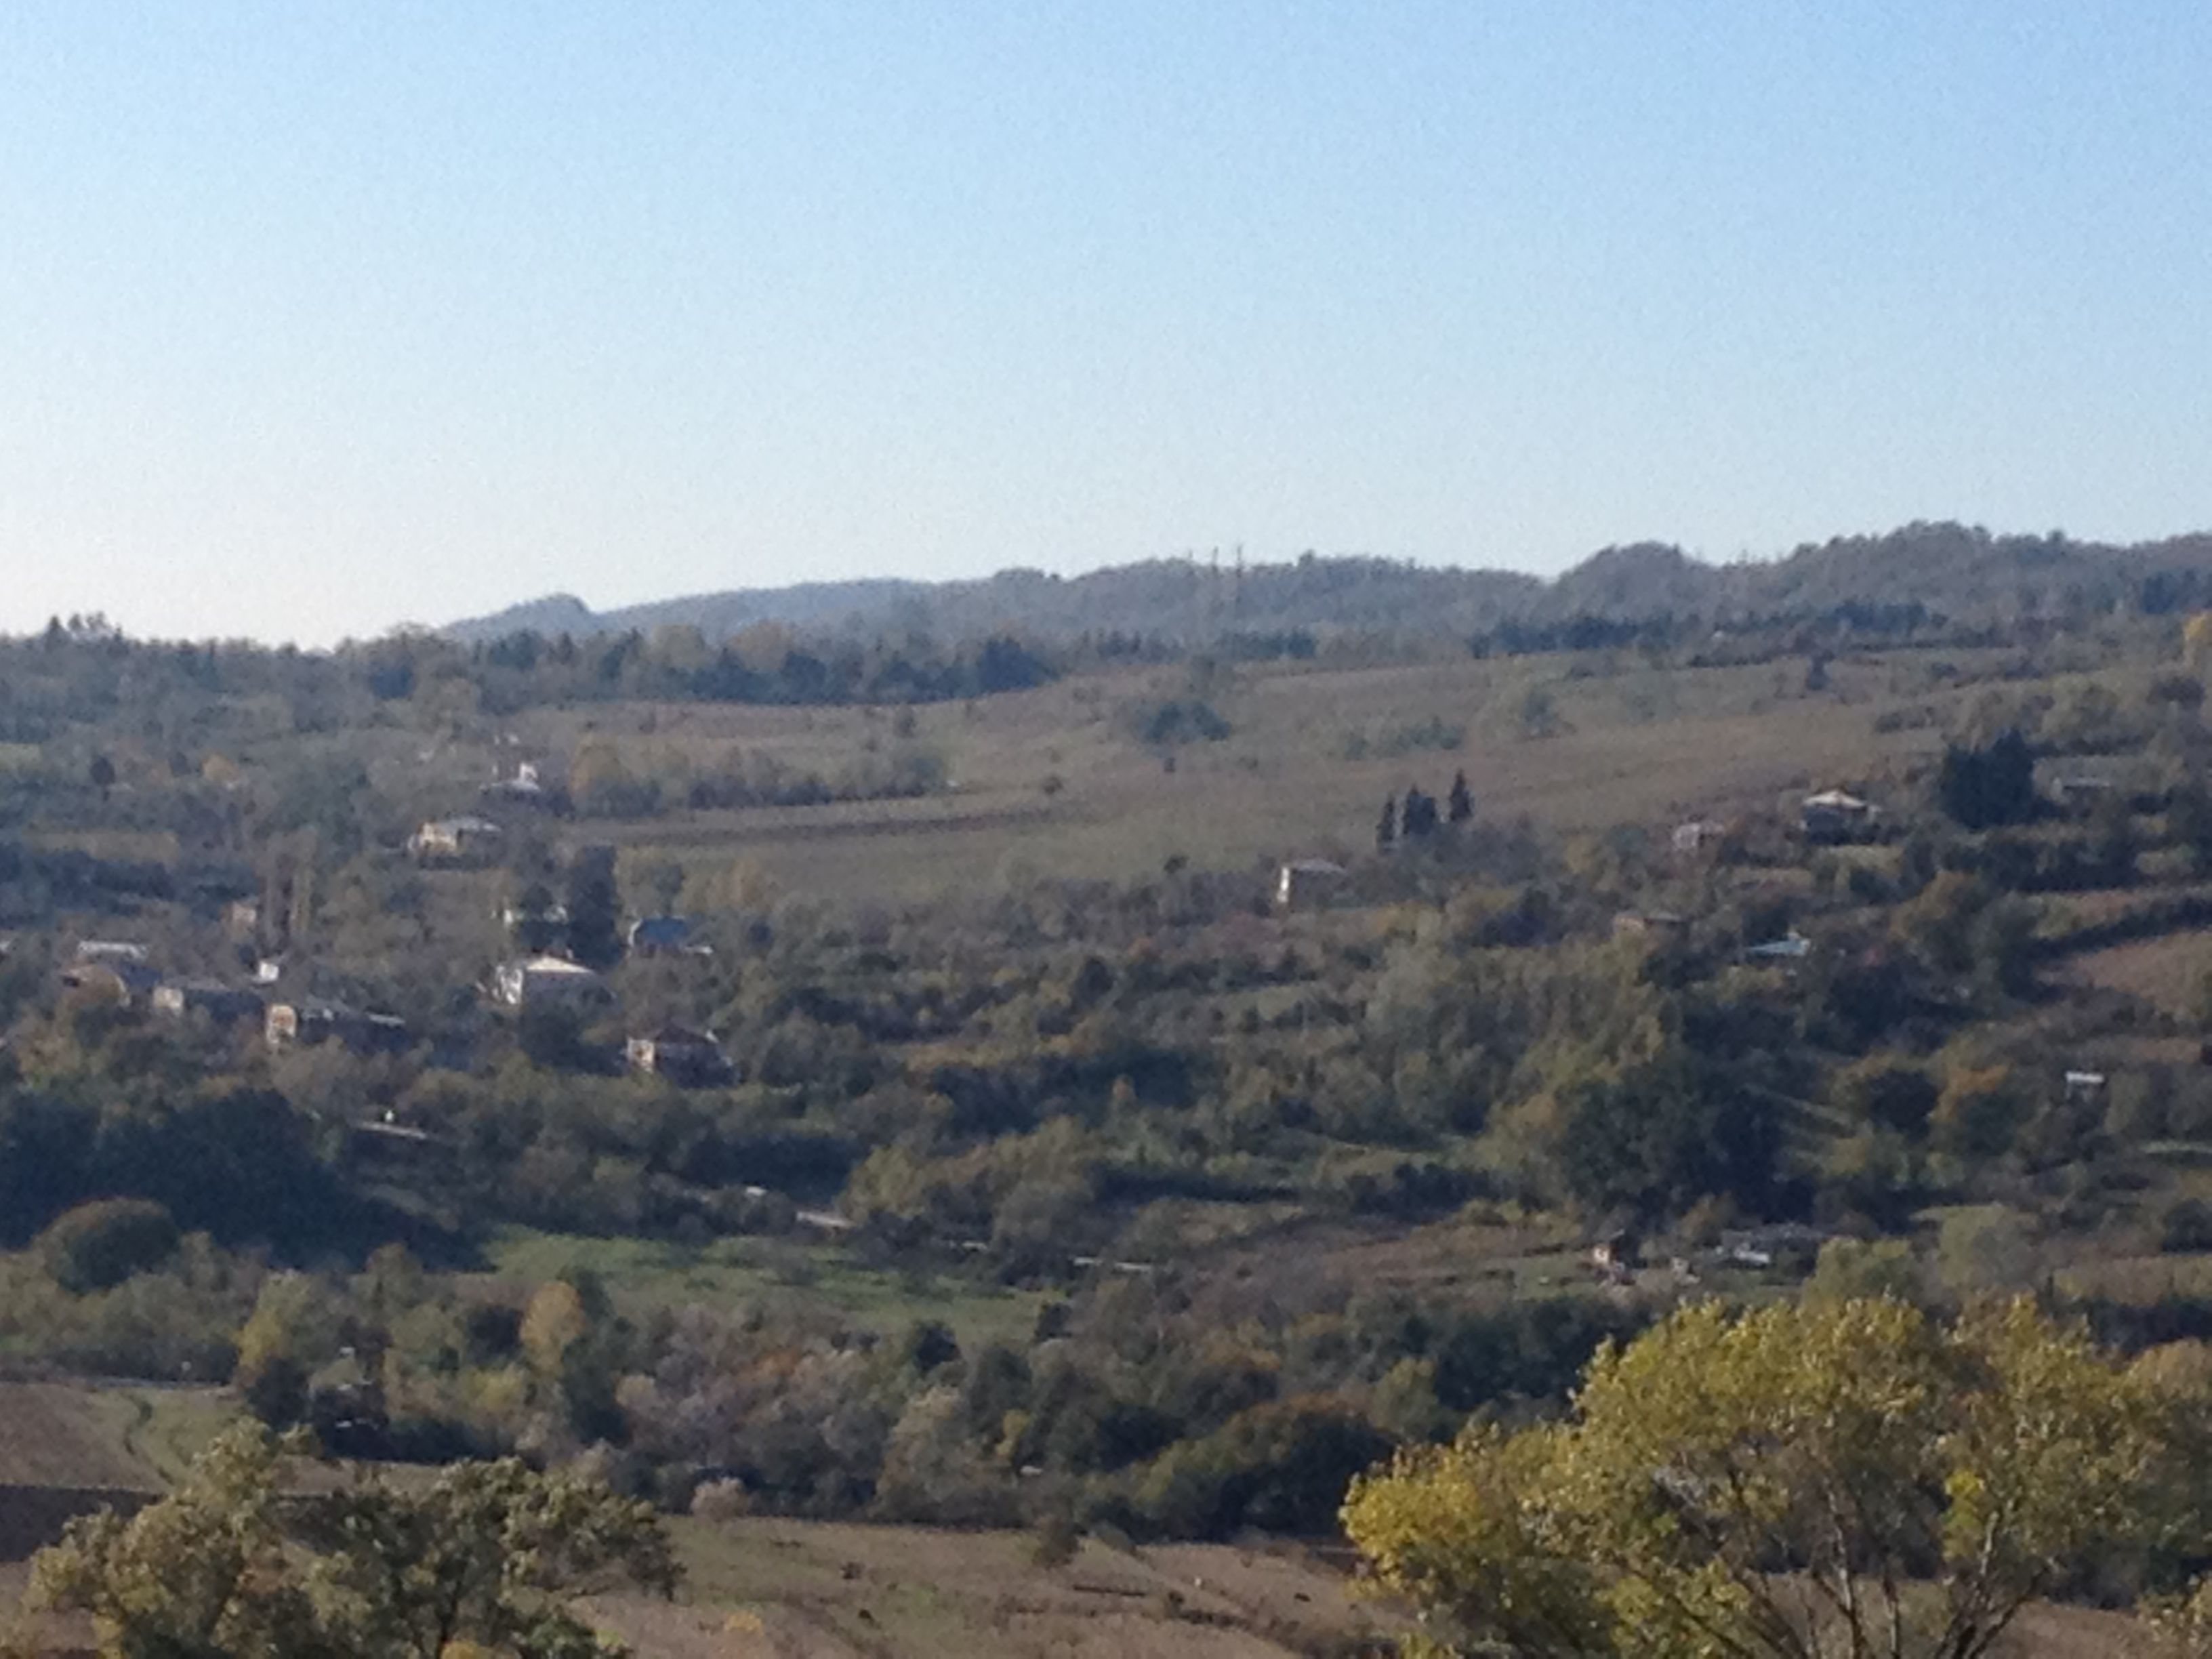 view from Dzevri, Republic of Georgia